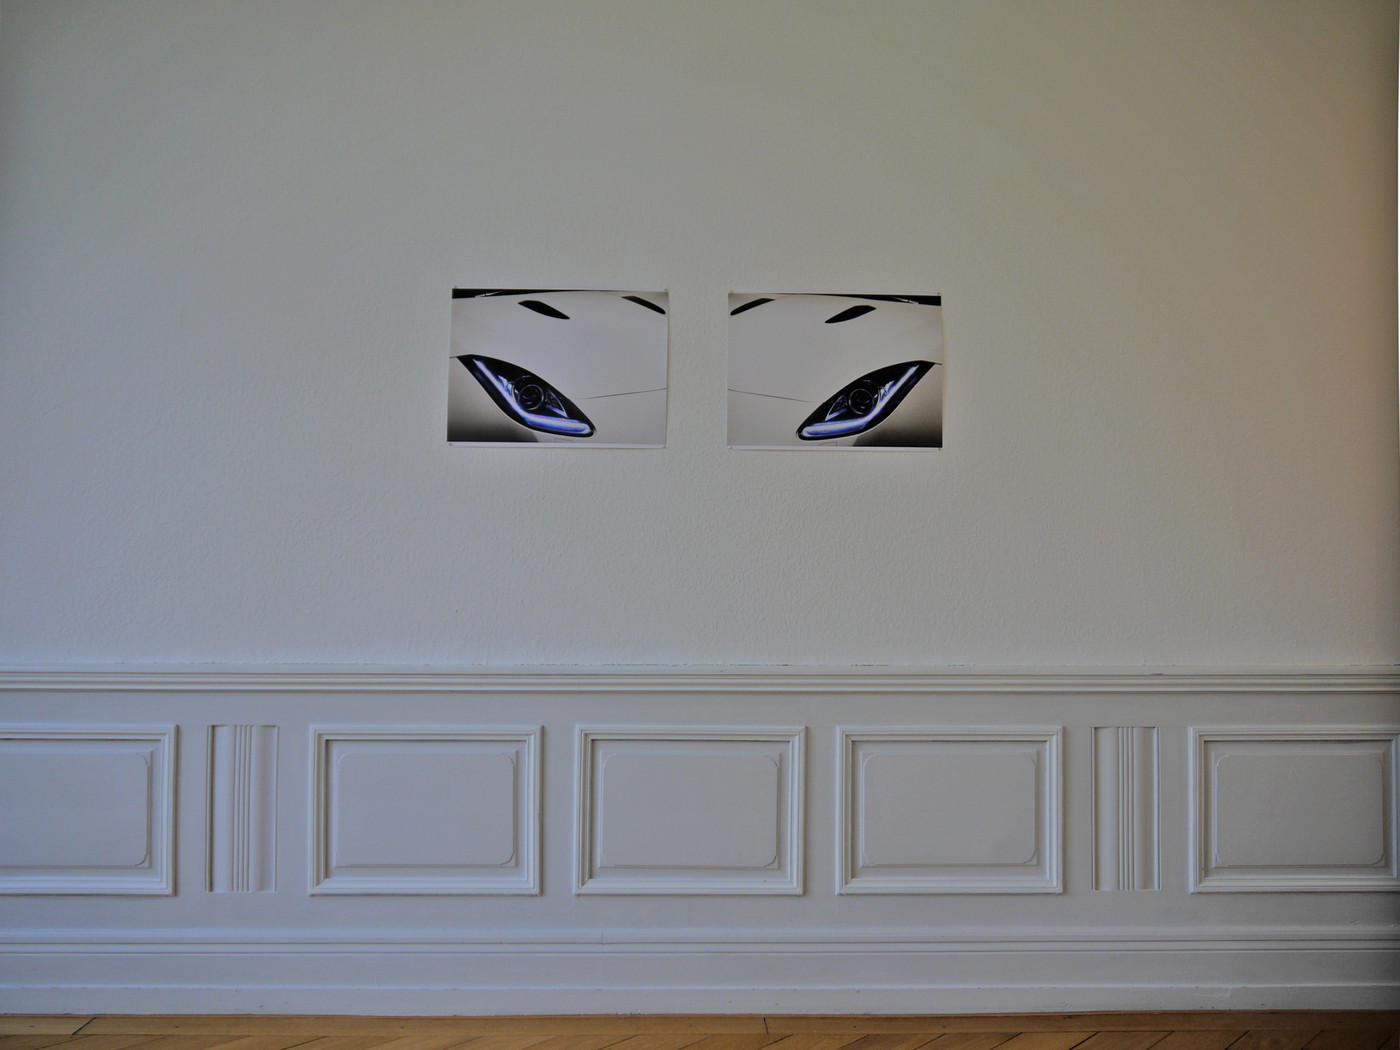 Salon Kennedy_PITFALLS_Benedikte Bjerre_Money over World_Frankfurt_Cultural Avenue_D